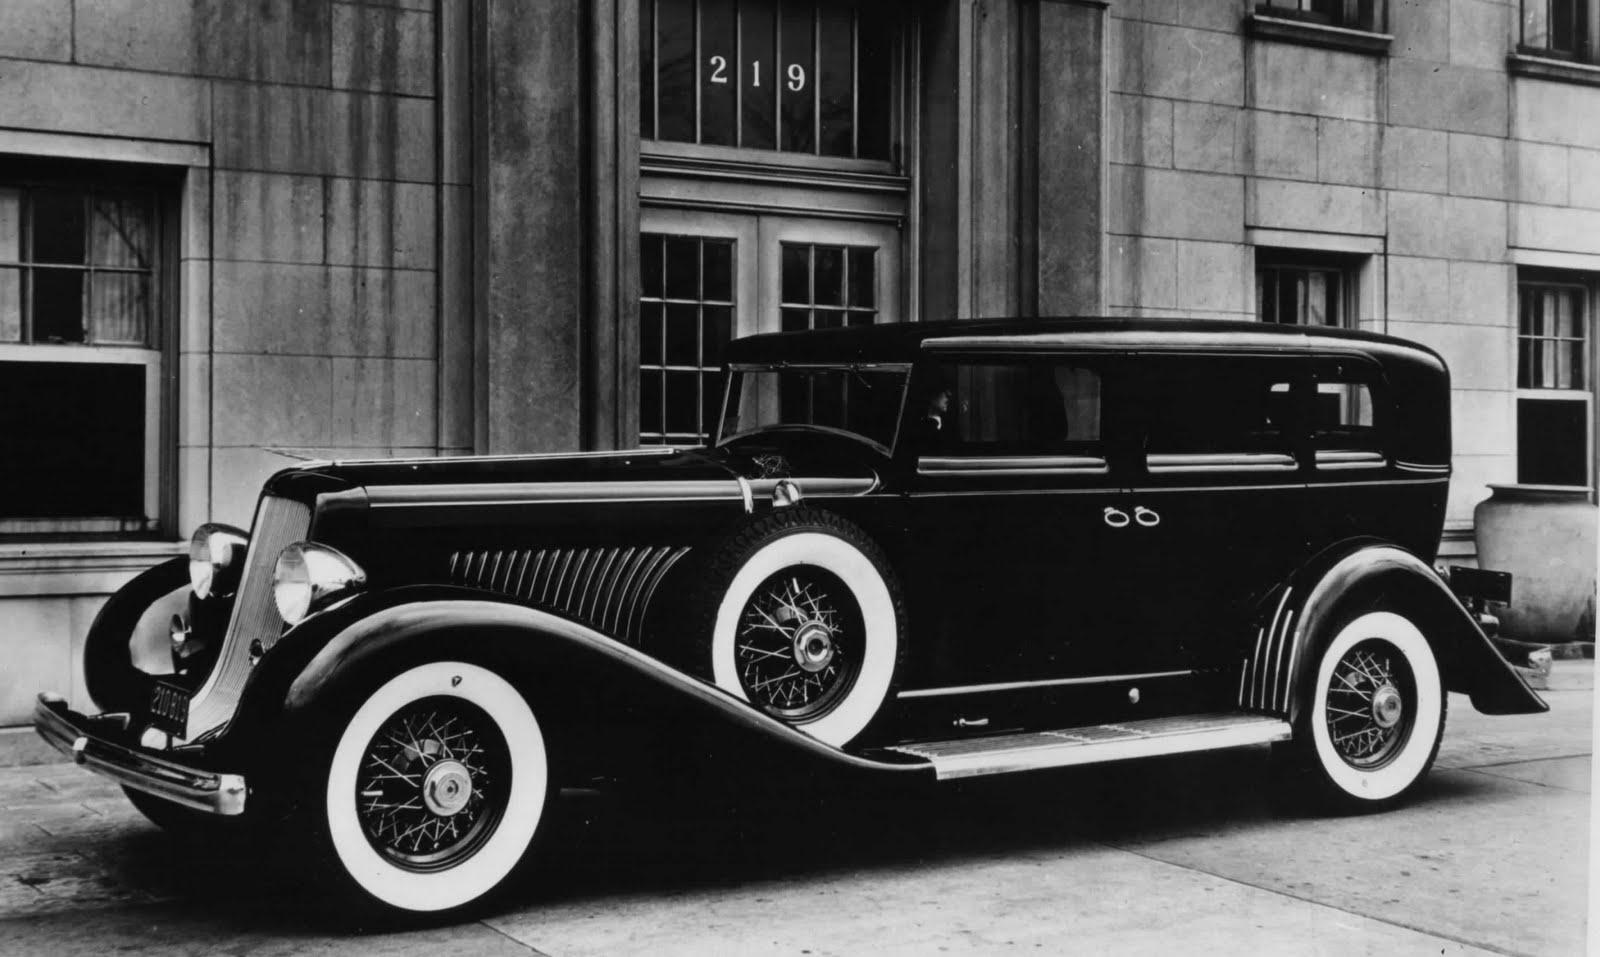 Classic Car Pics |Nice cars club